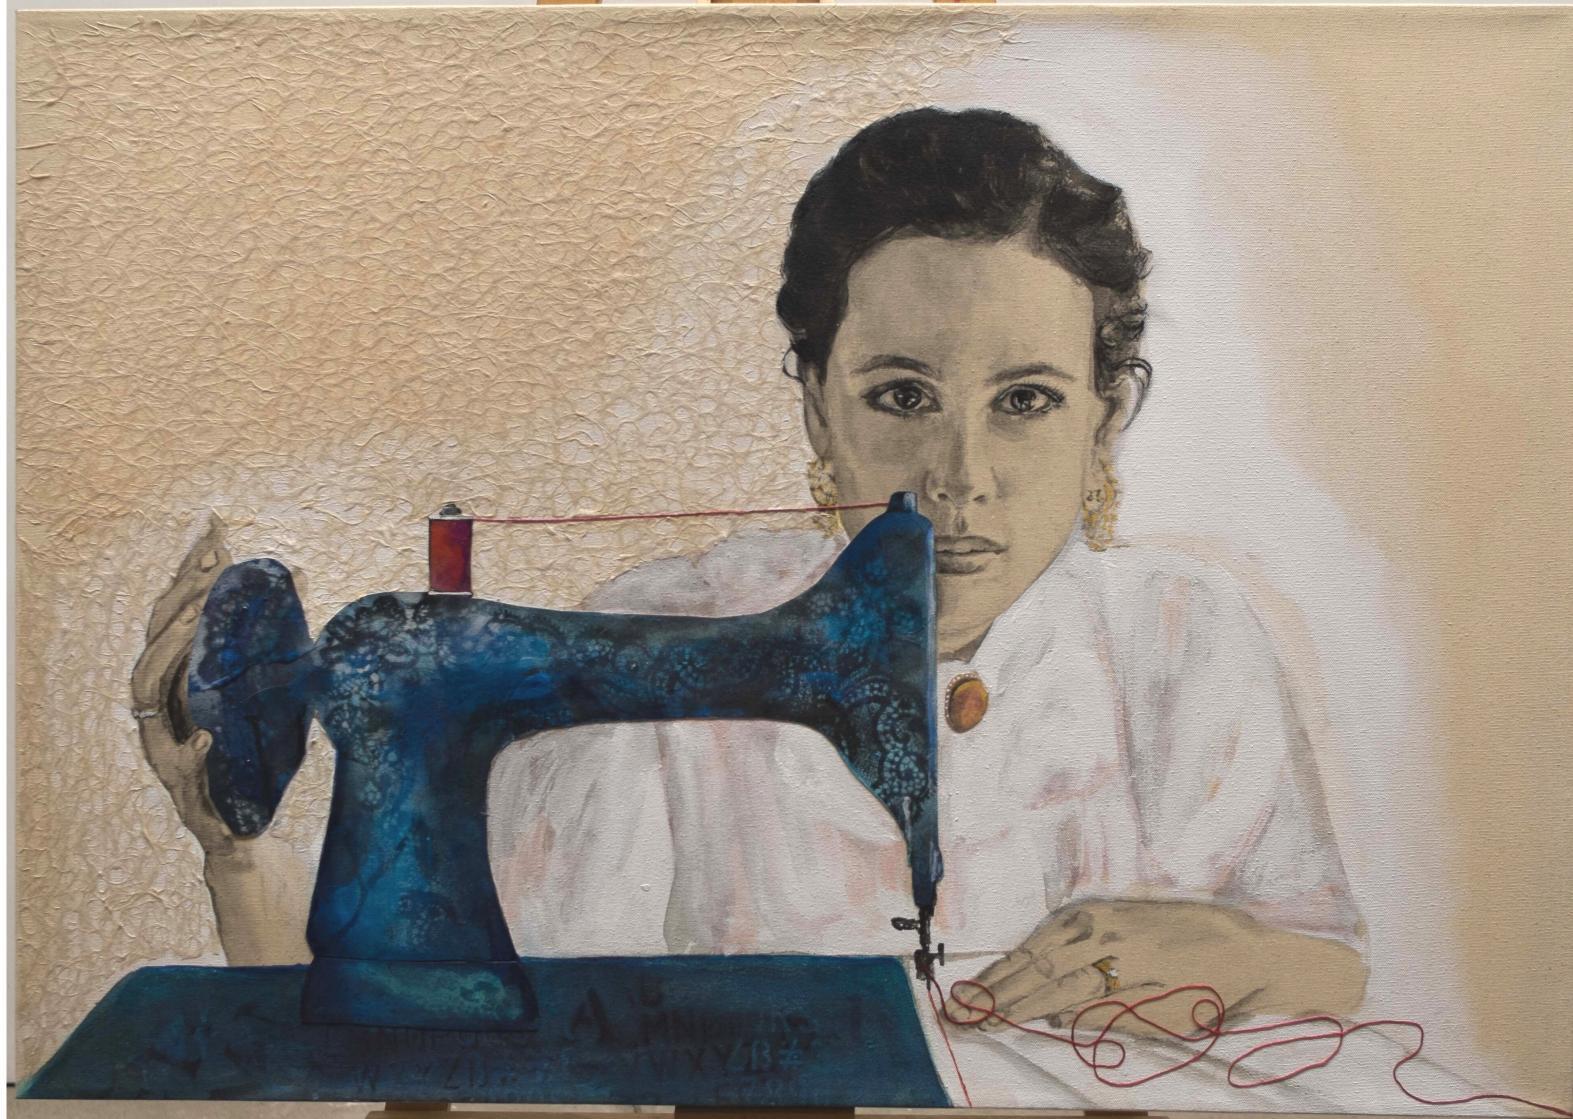 La Costurera (2017) - Alejandra Phelts Ramos - Alejandra Phelts